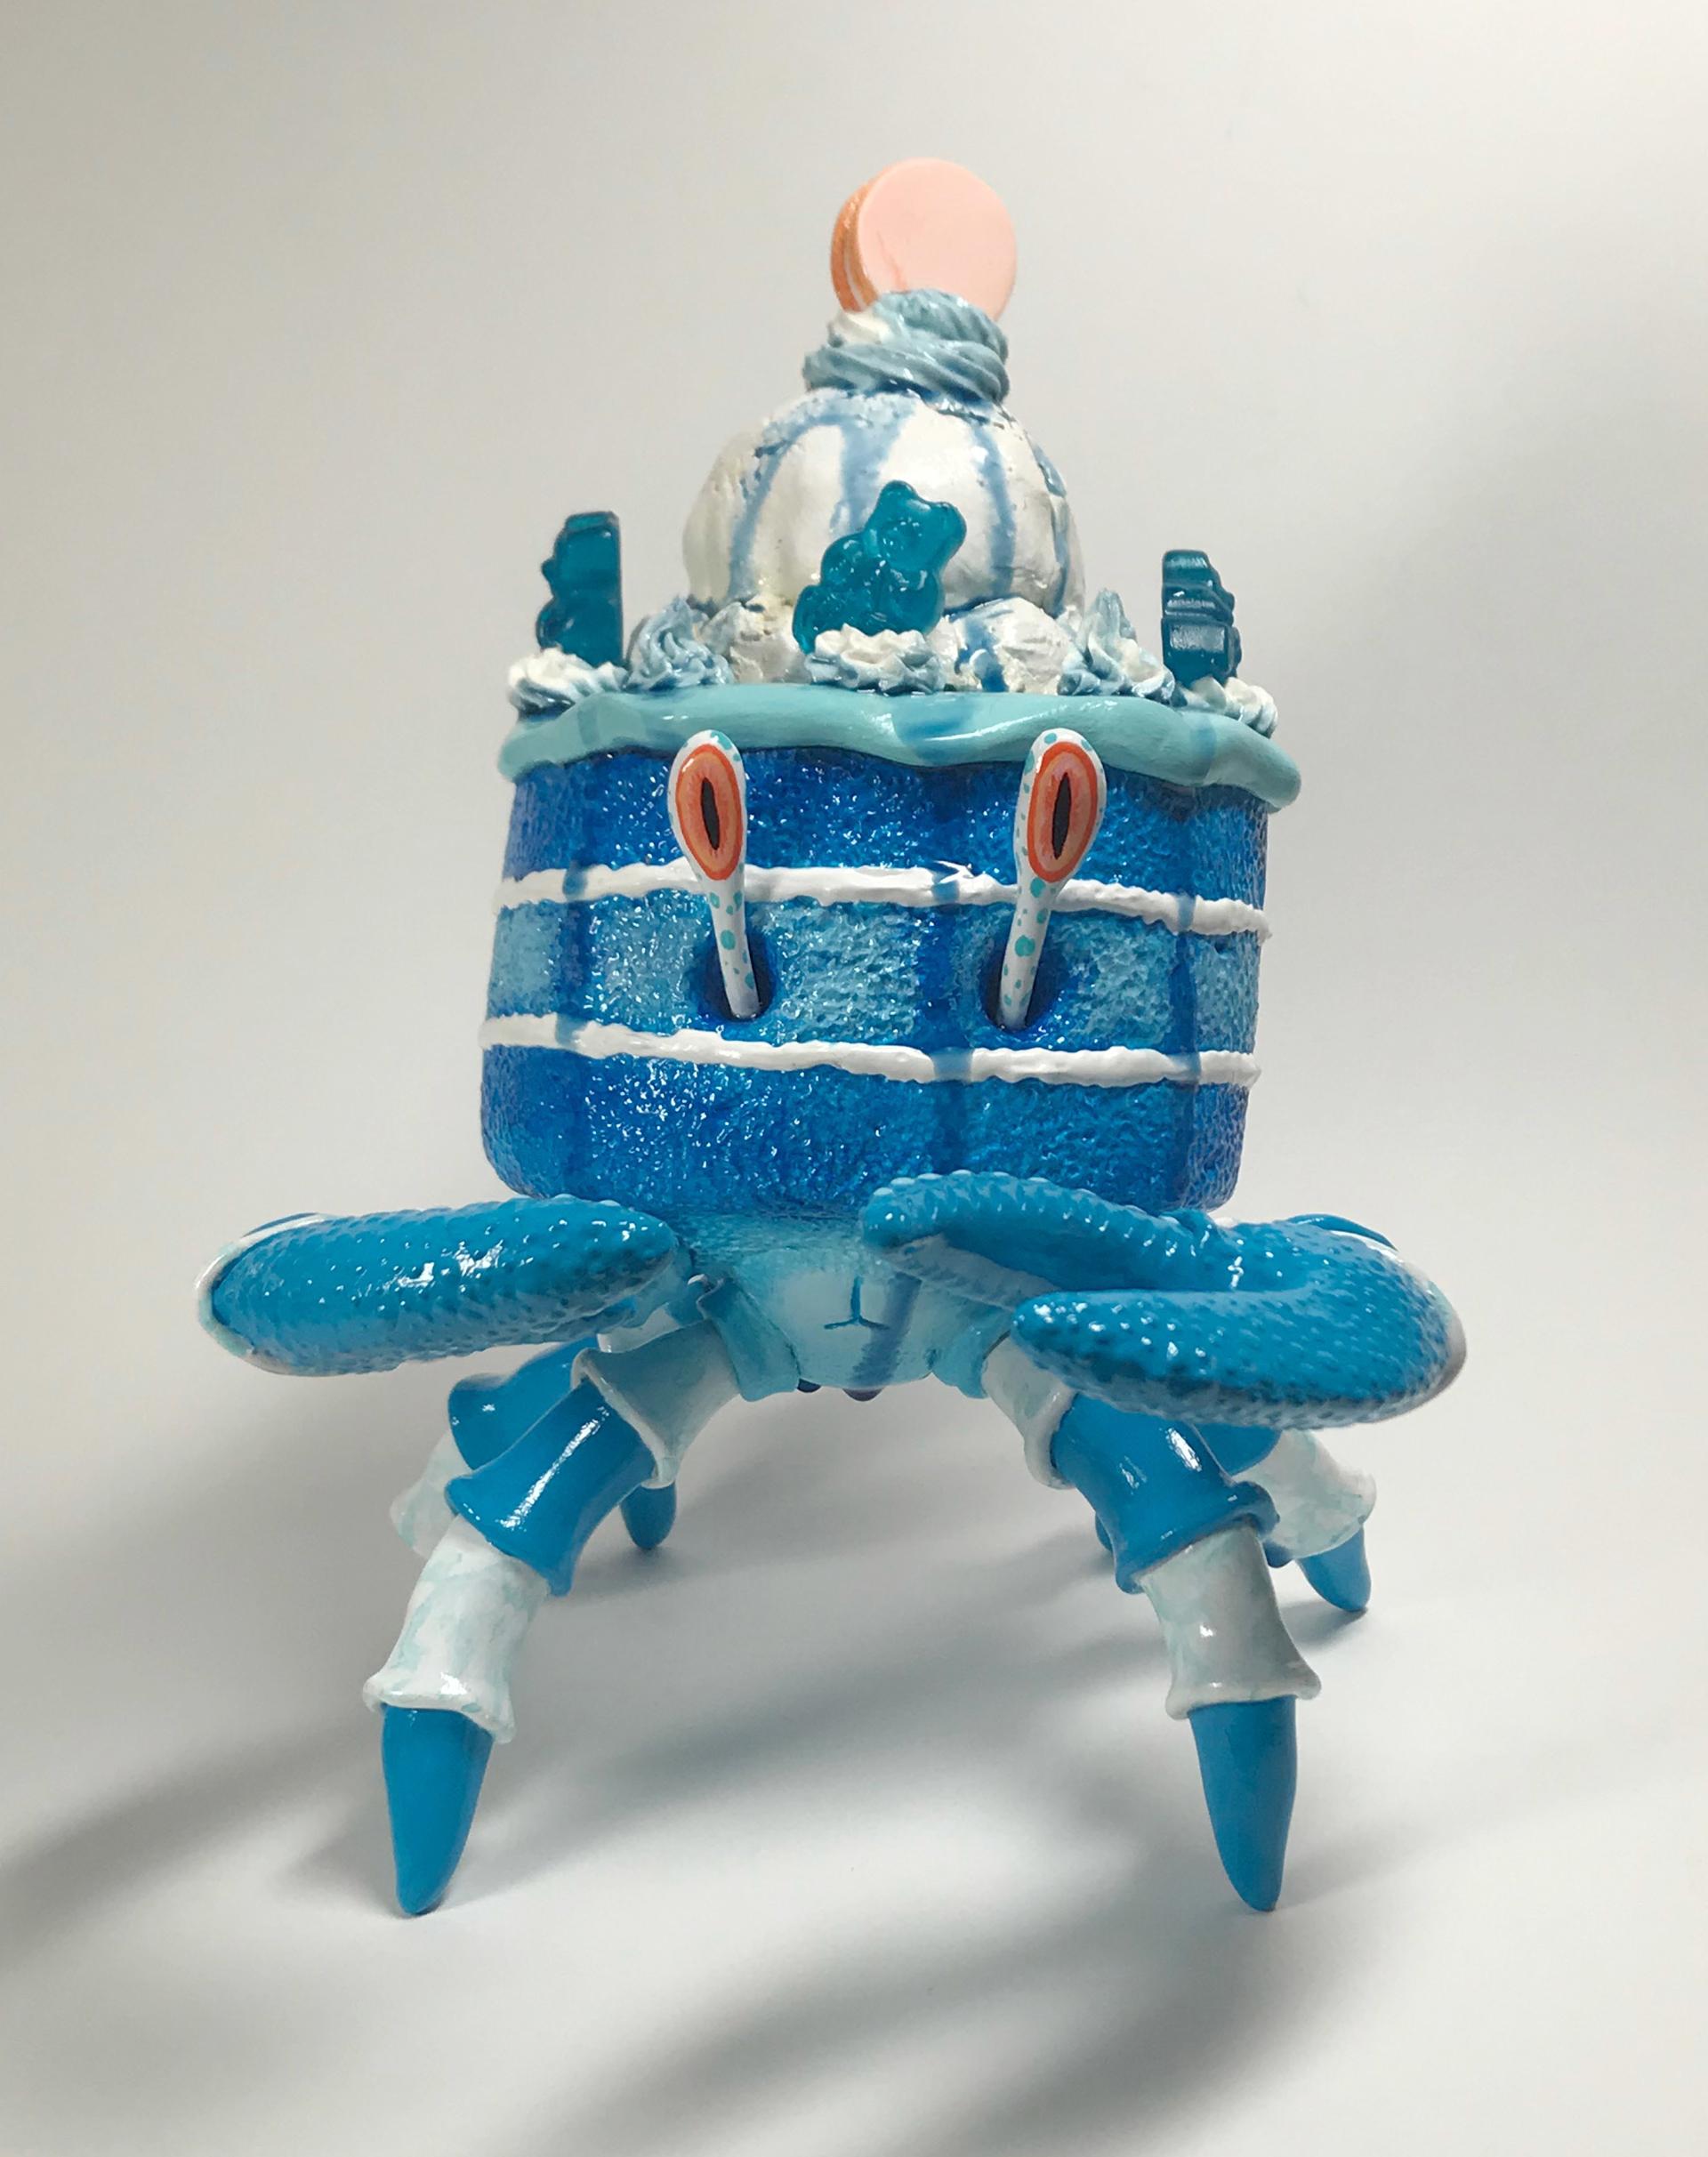 Blue Raspberry Crabcake by Corina St. Martin